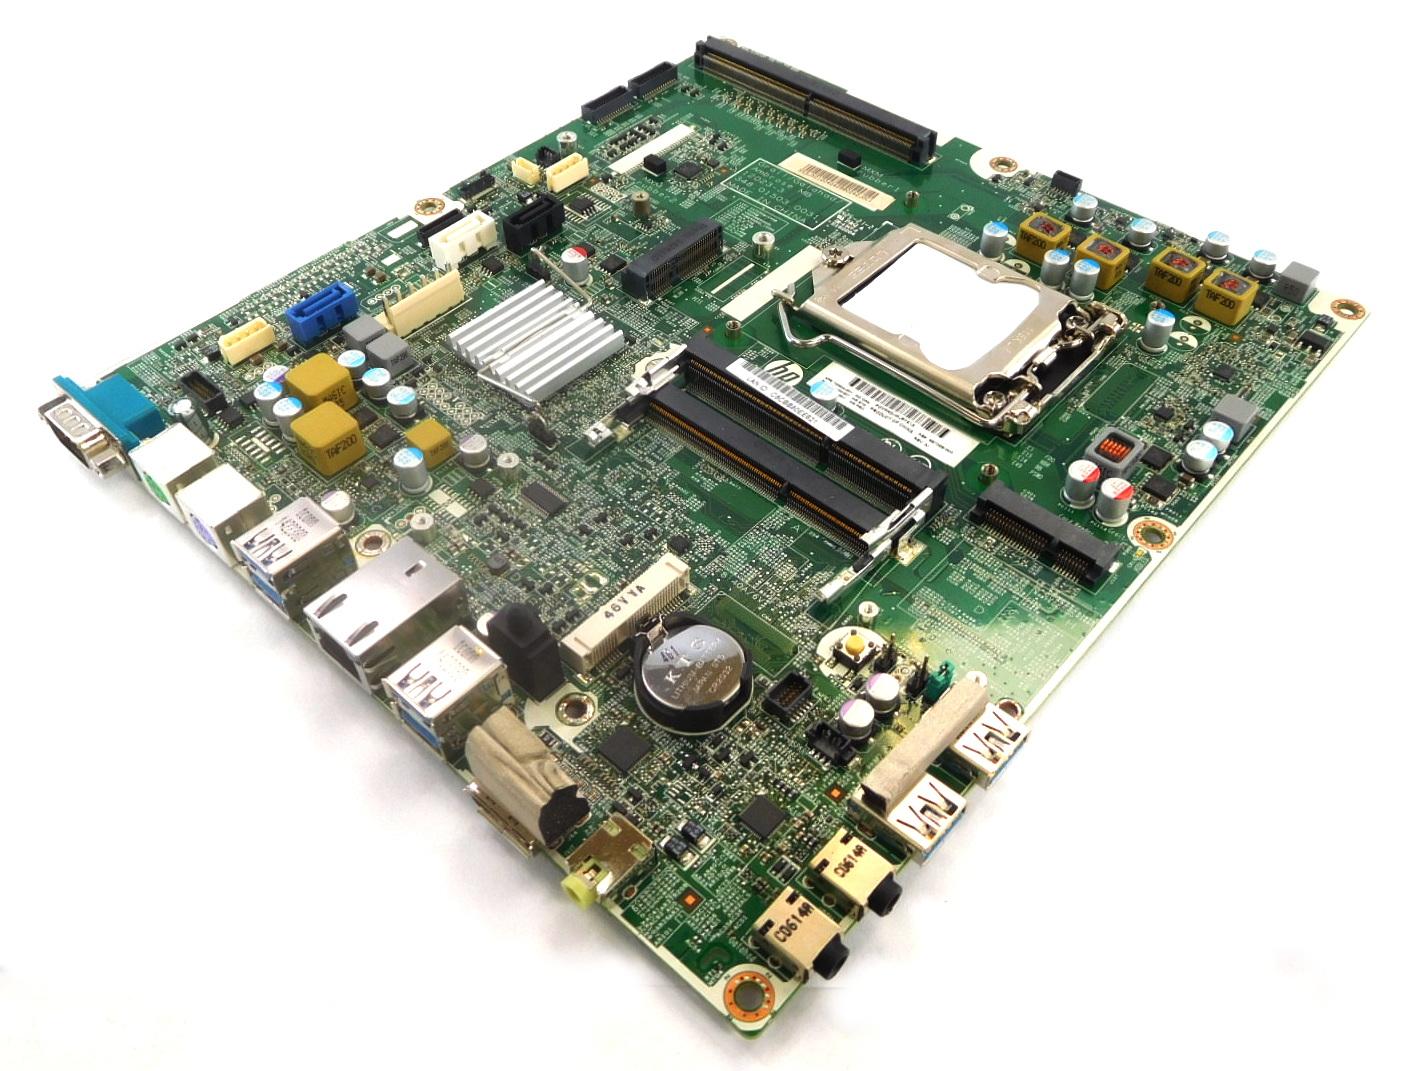 697289-003 HP EliteOne 800 G1 AIO PC Motherboard Grail/Galahad/Ambrose 12023-3